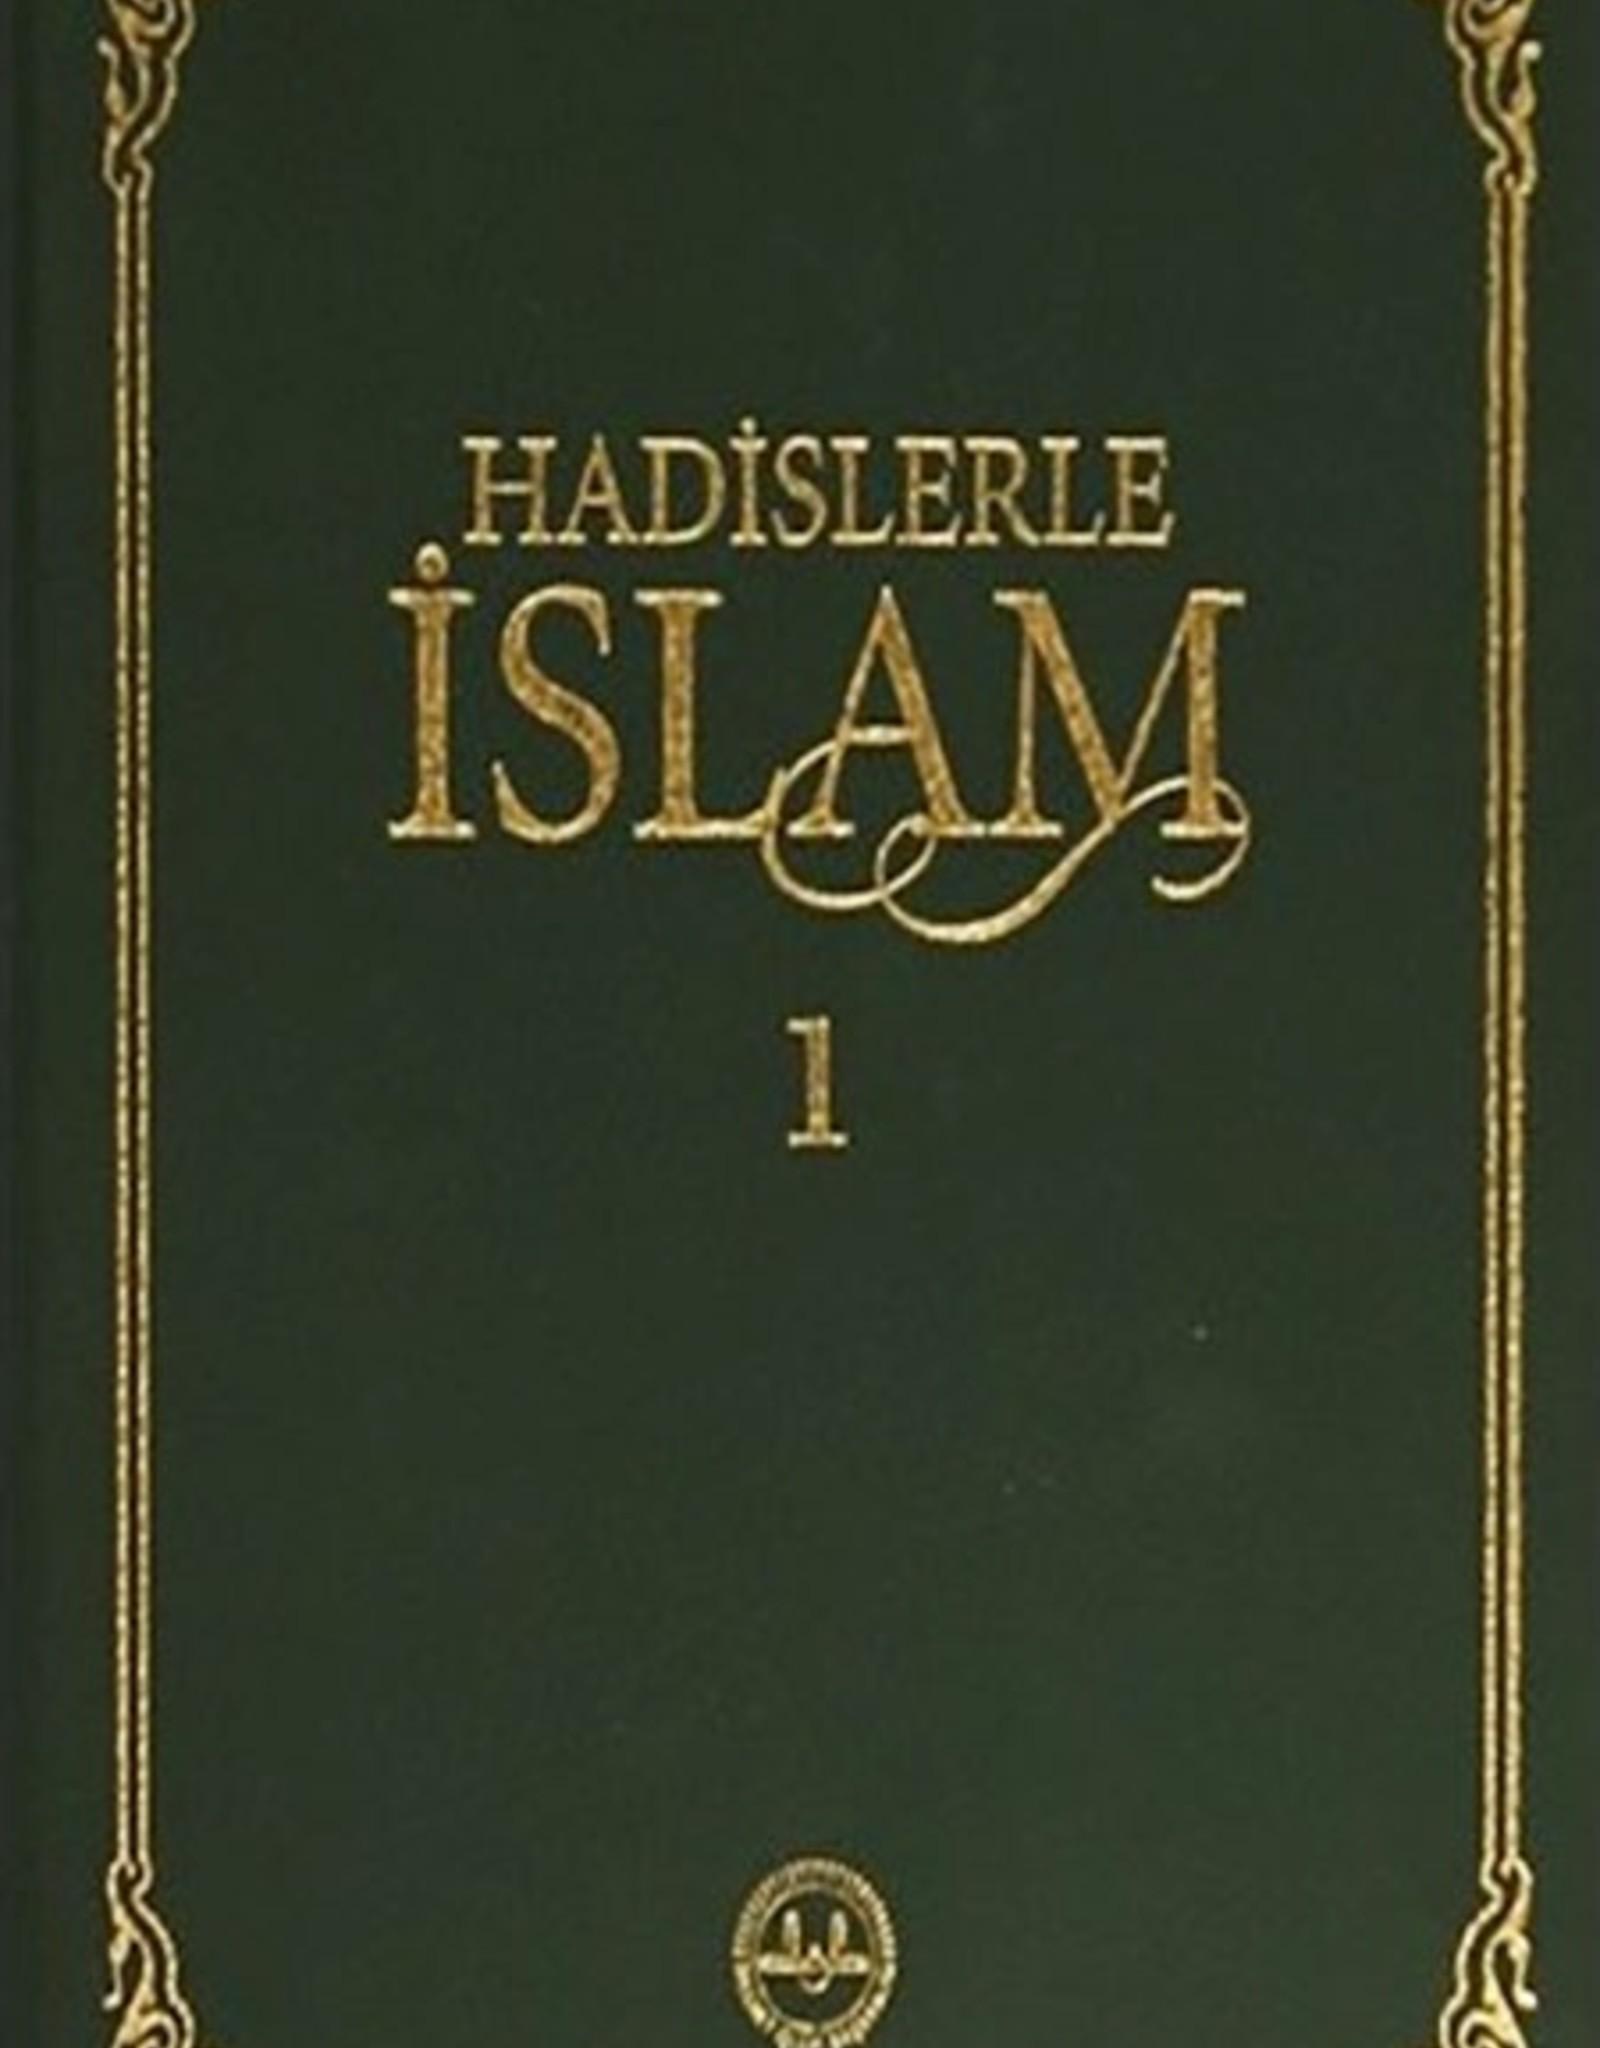 Hadislerle Islam Orta Boy (7 Cilt)